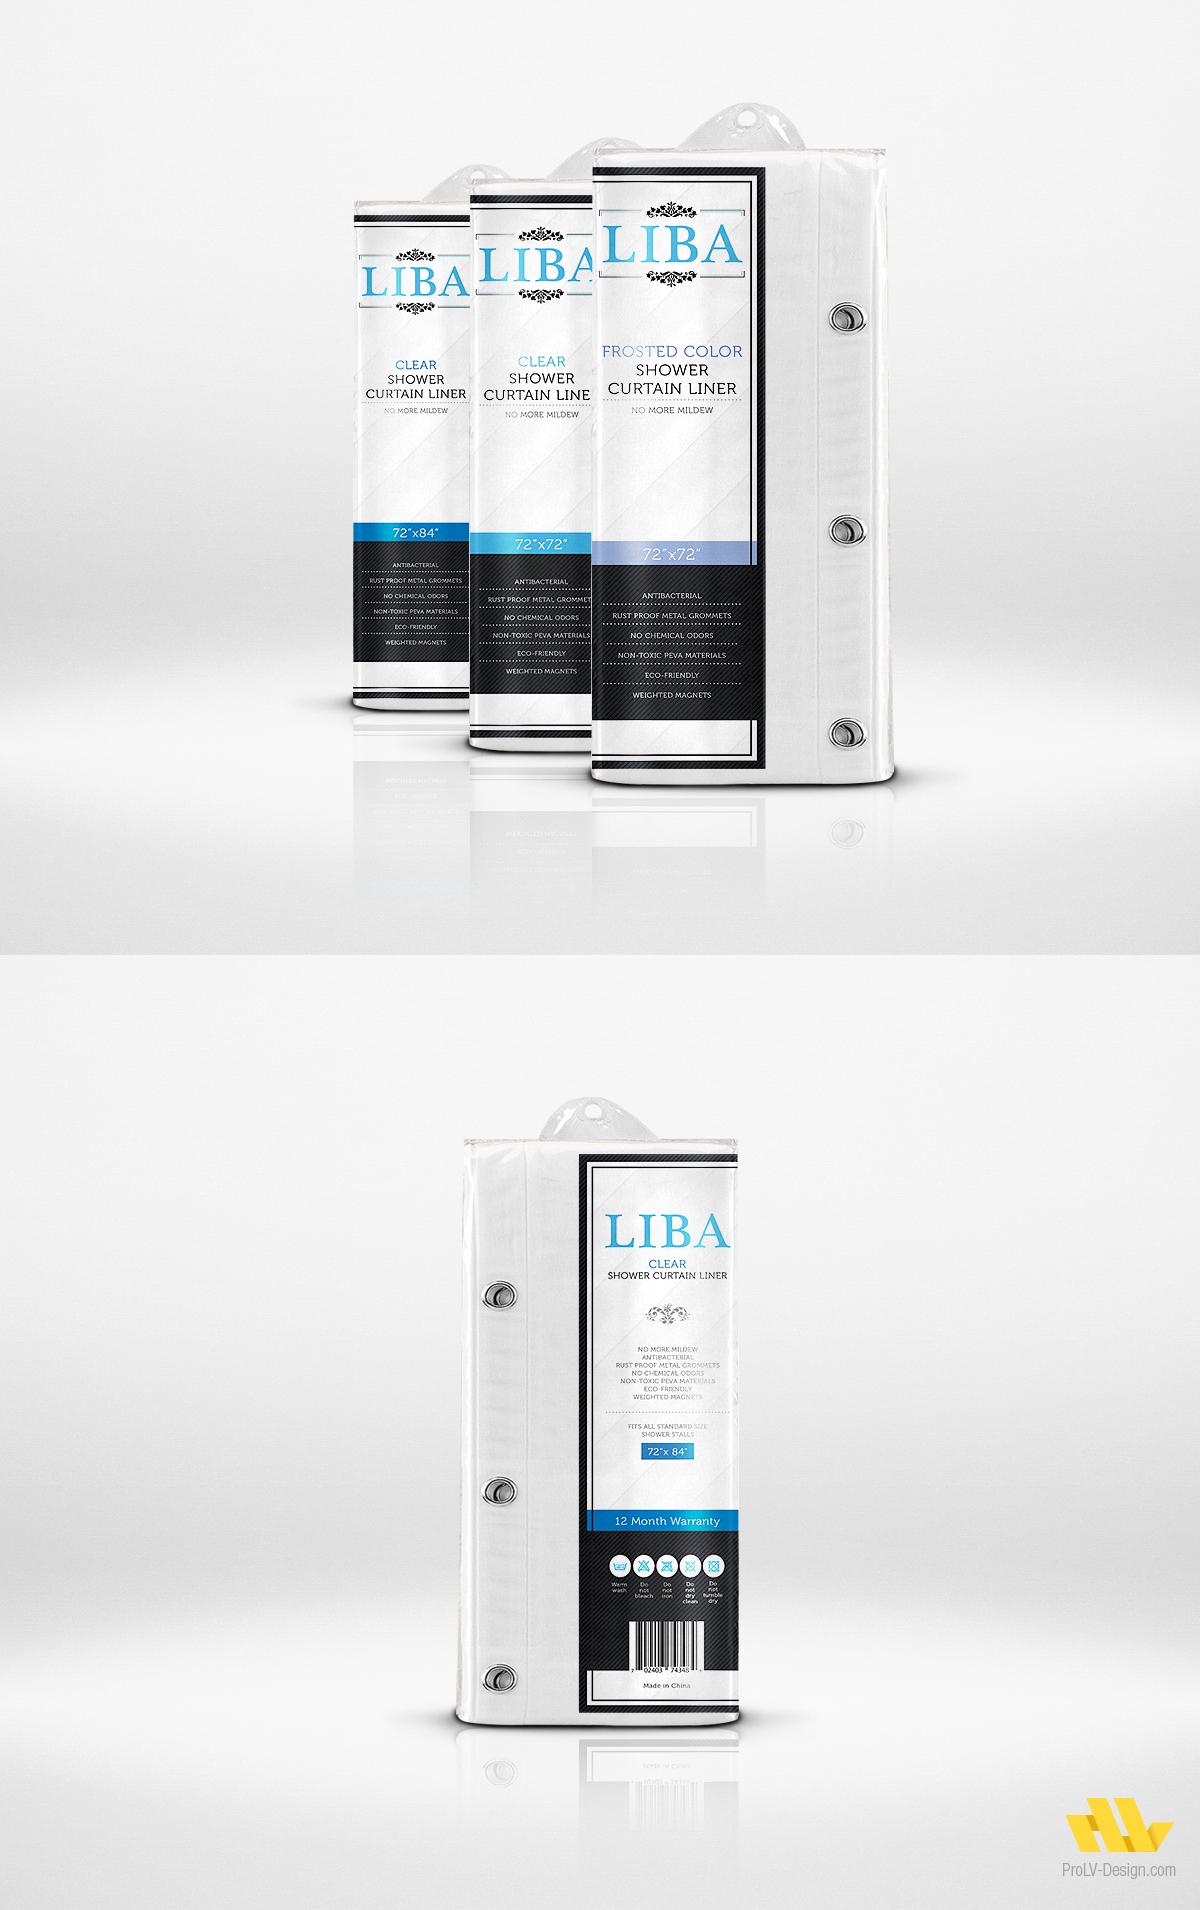 Finished Label Design Project For Liba Shower Curtain Liner